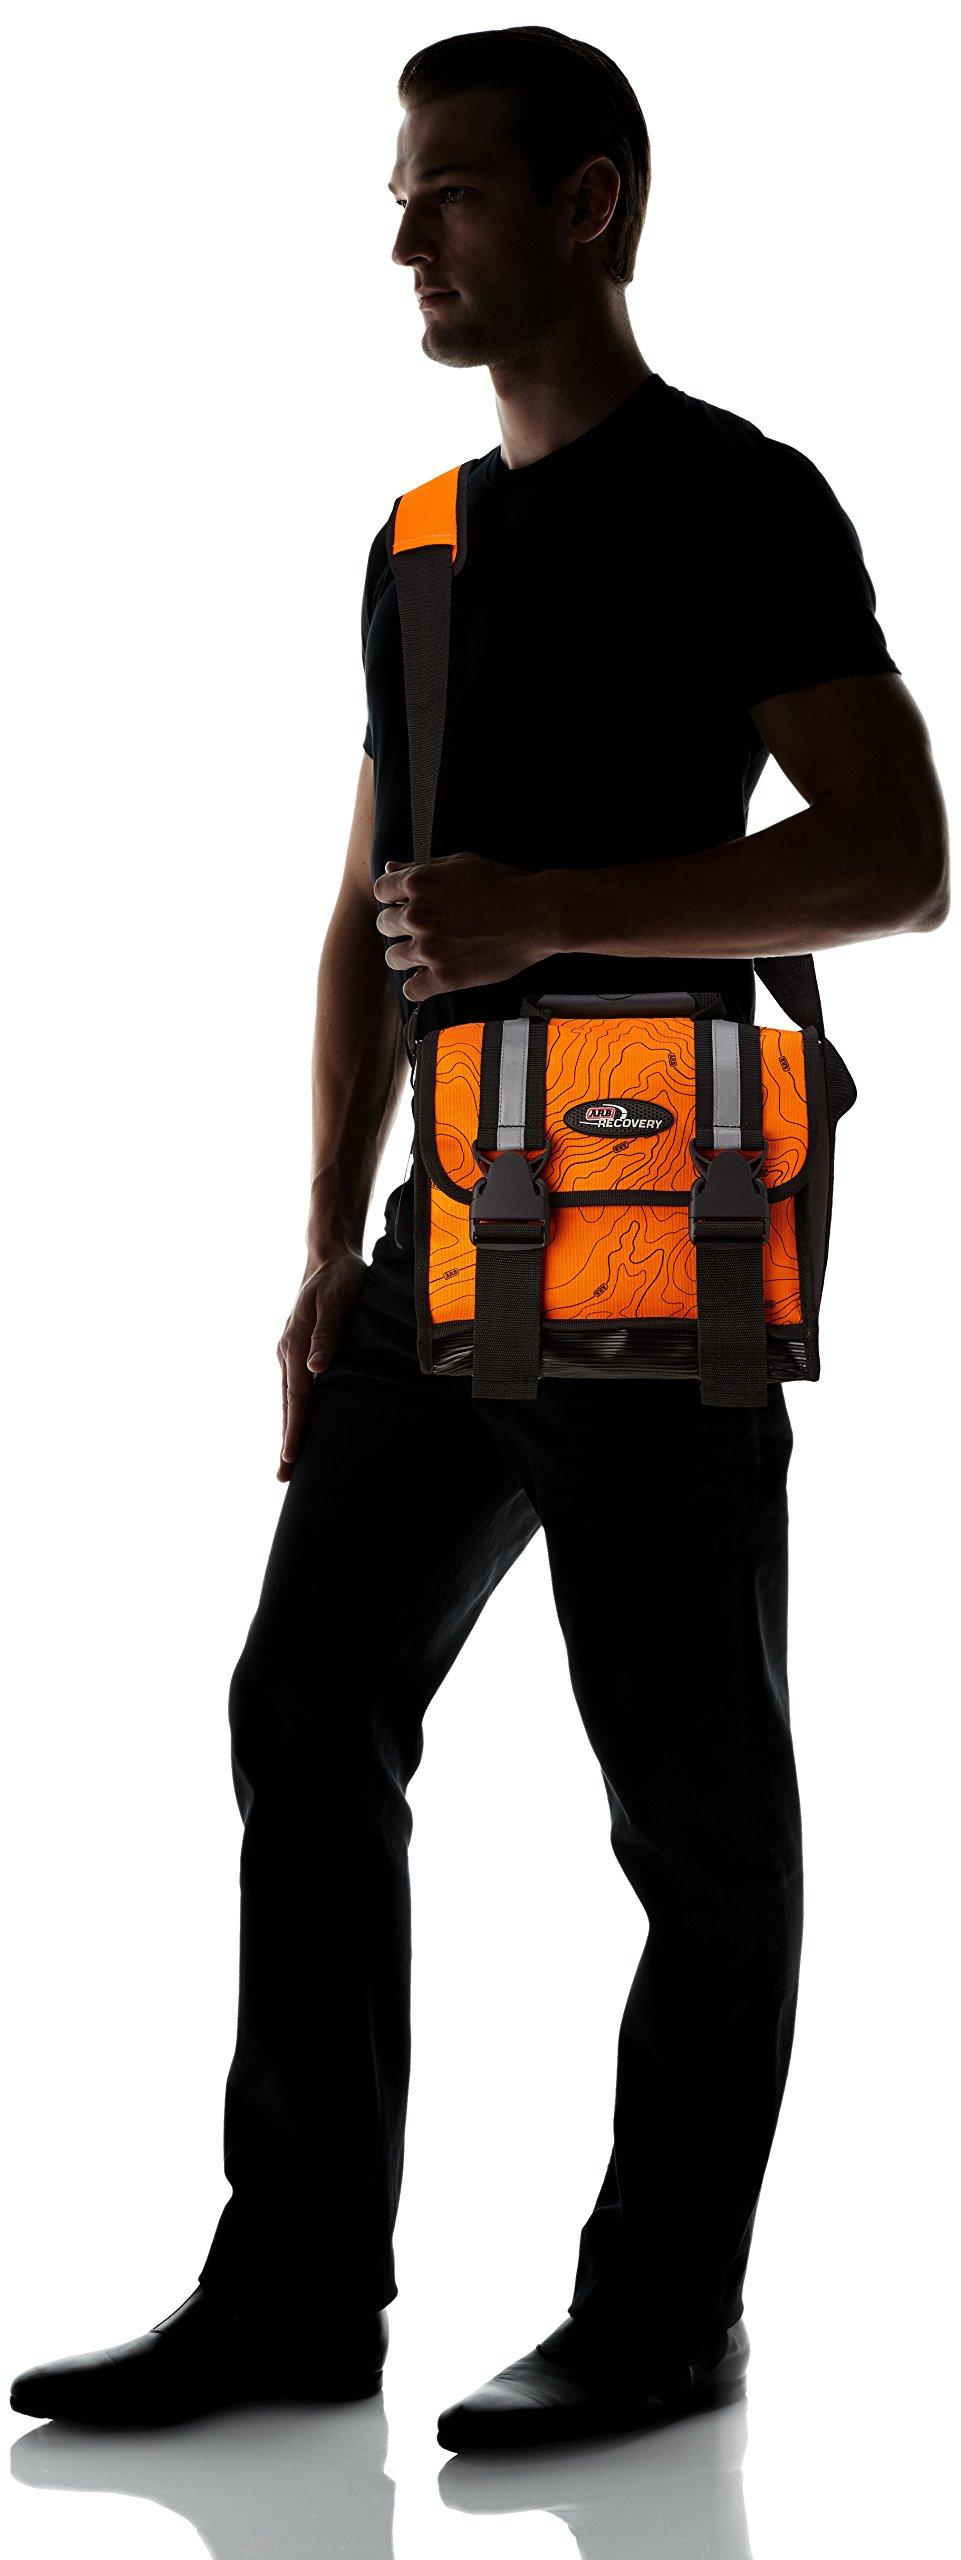 ARB ARB502 Orange Small Recovery Bag by ARB (Image #5)